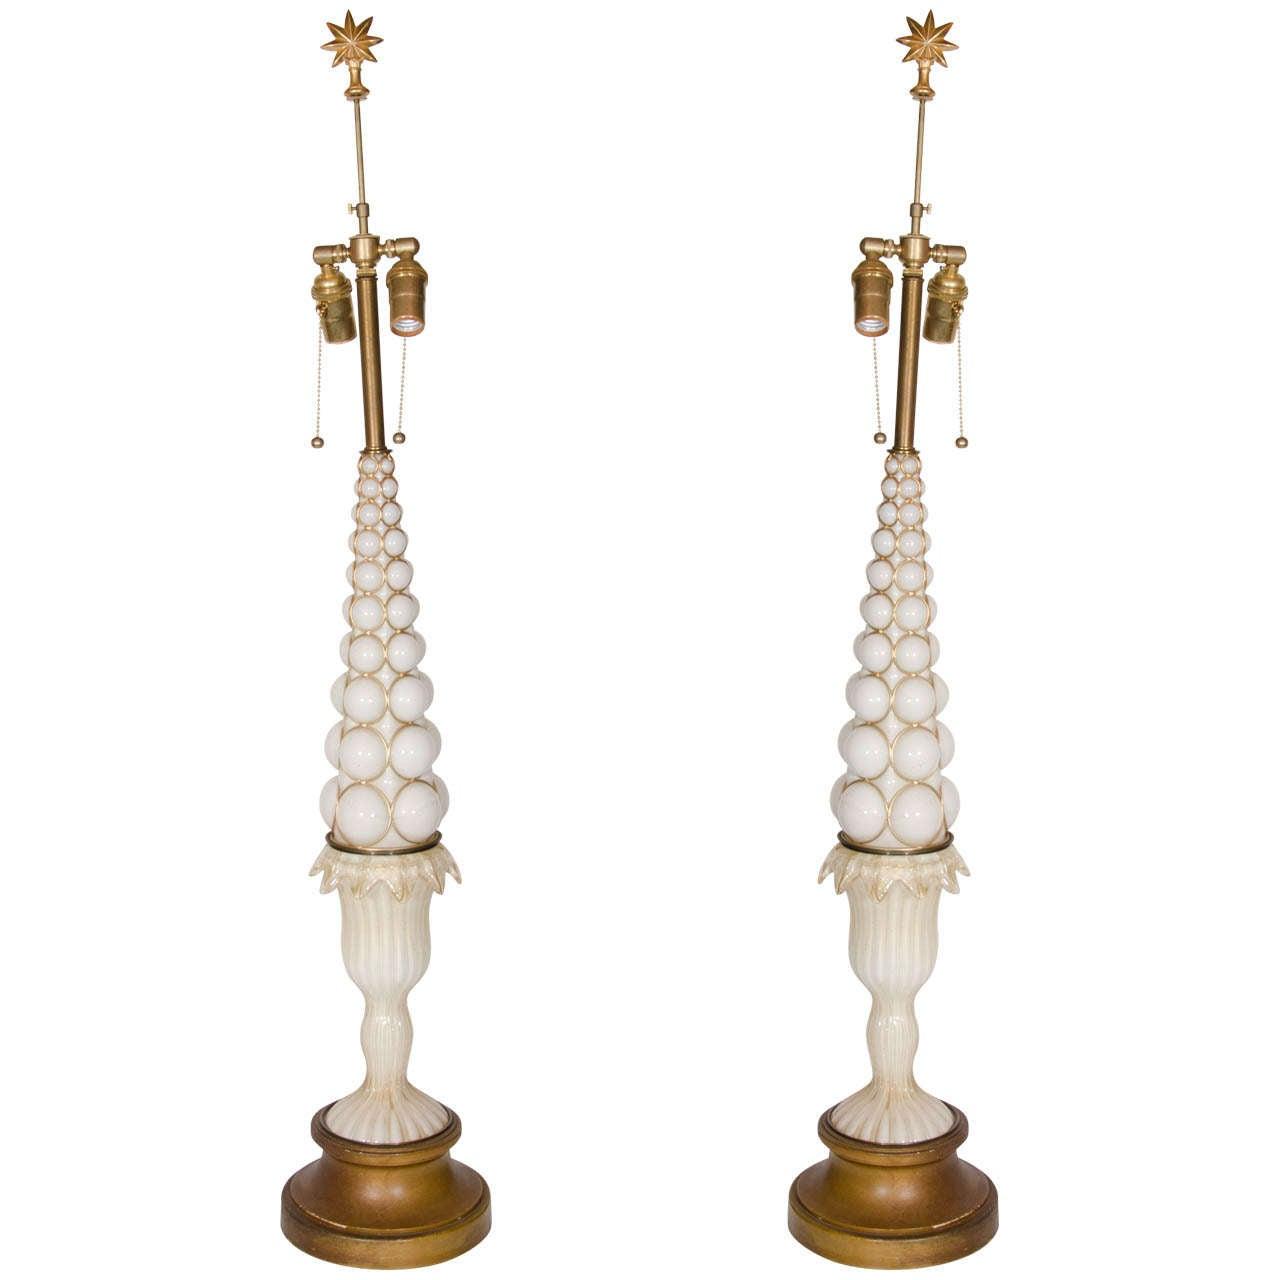 Pair of Antique Italian Art Deco Murano Gold and Cream Glass Lamps, circa 1940